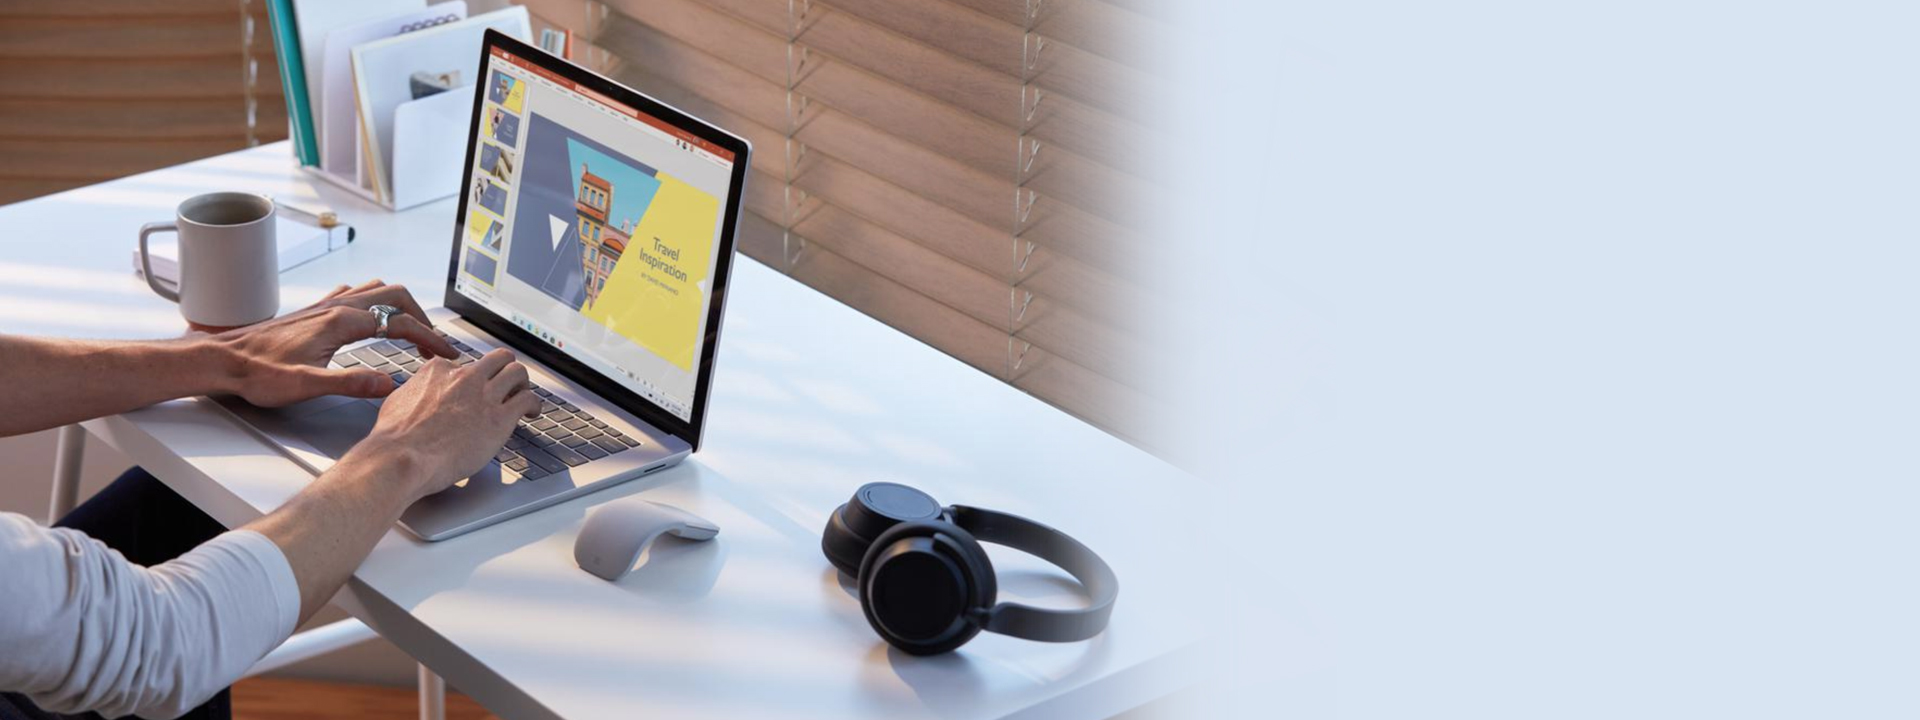 Surface Laptop 3 og Surface Headphones på et bord